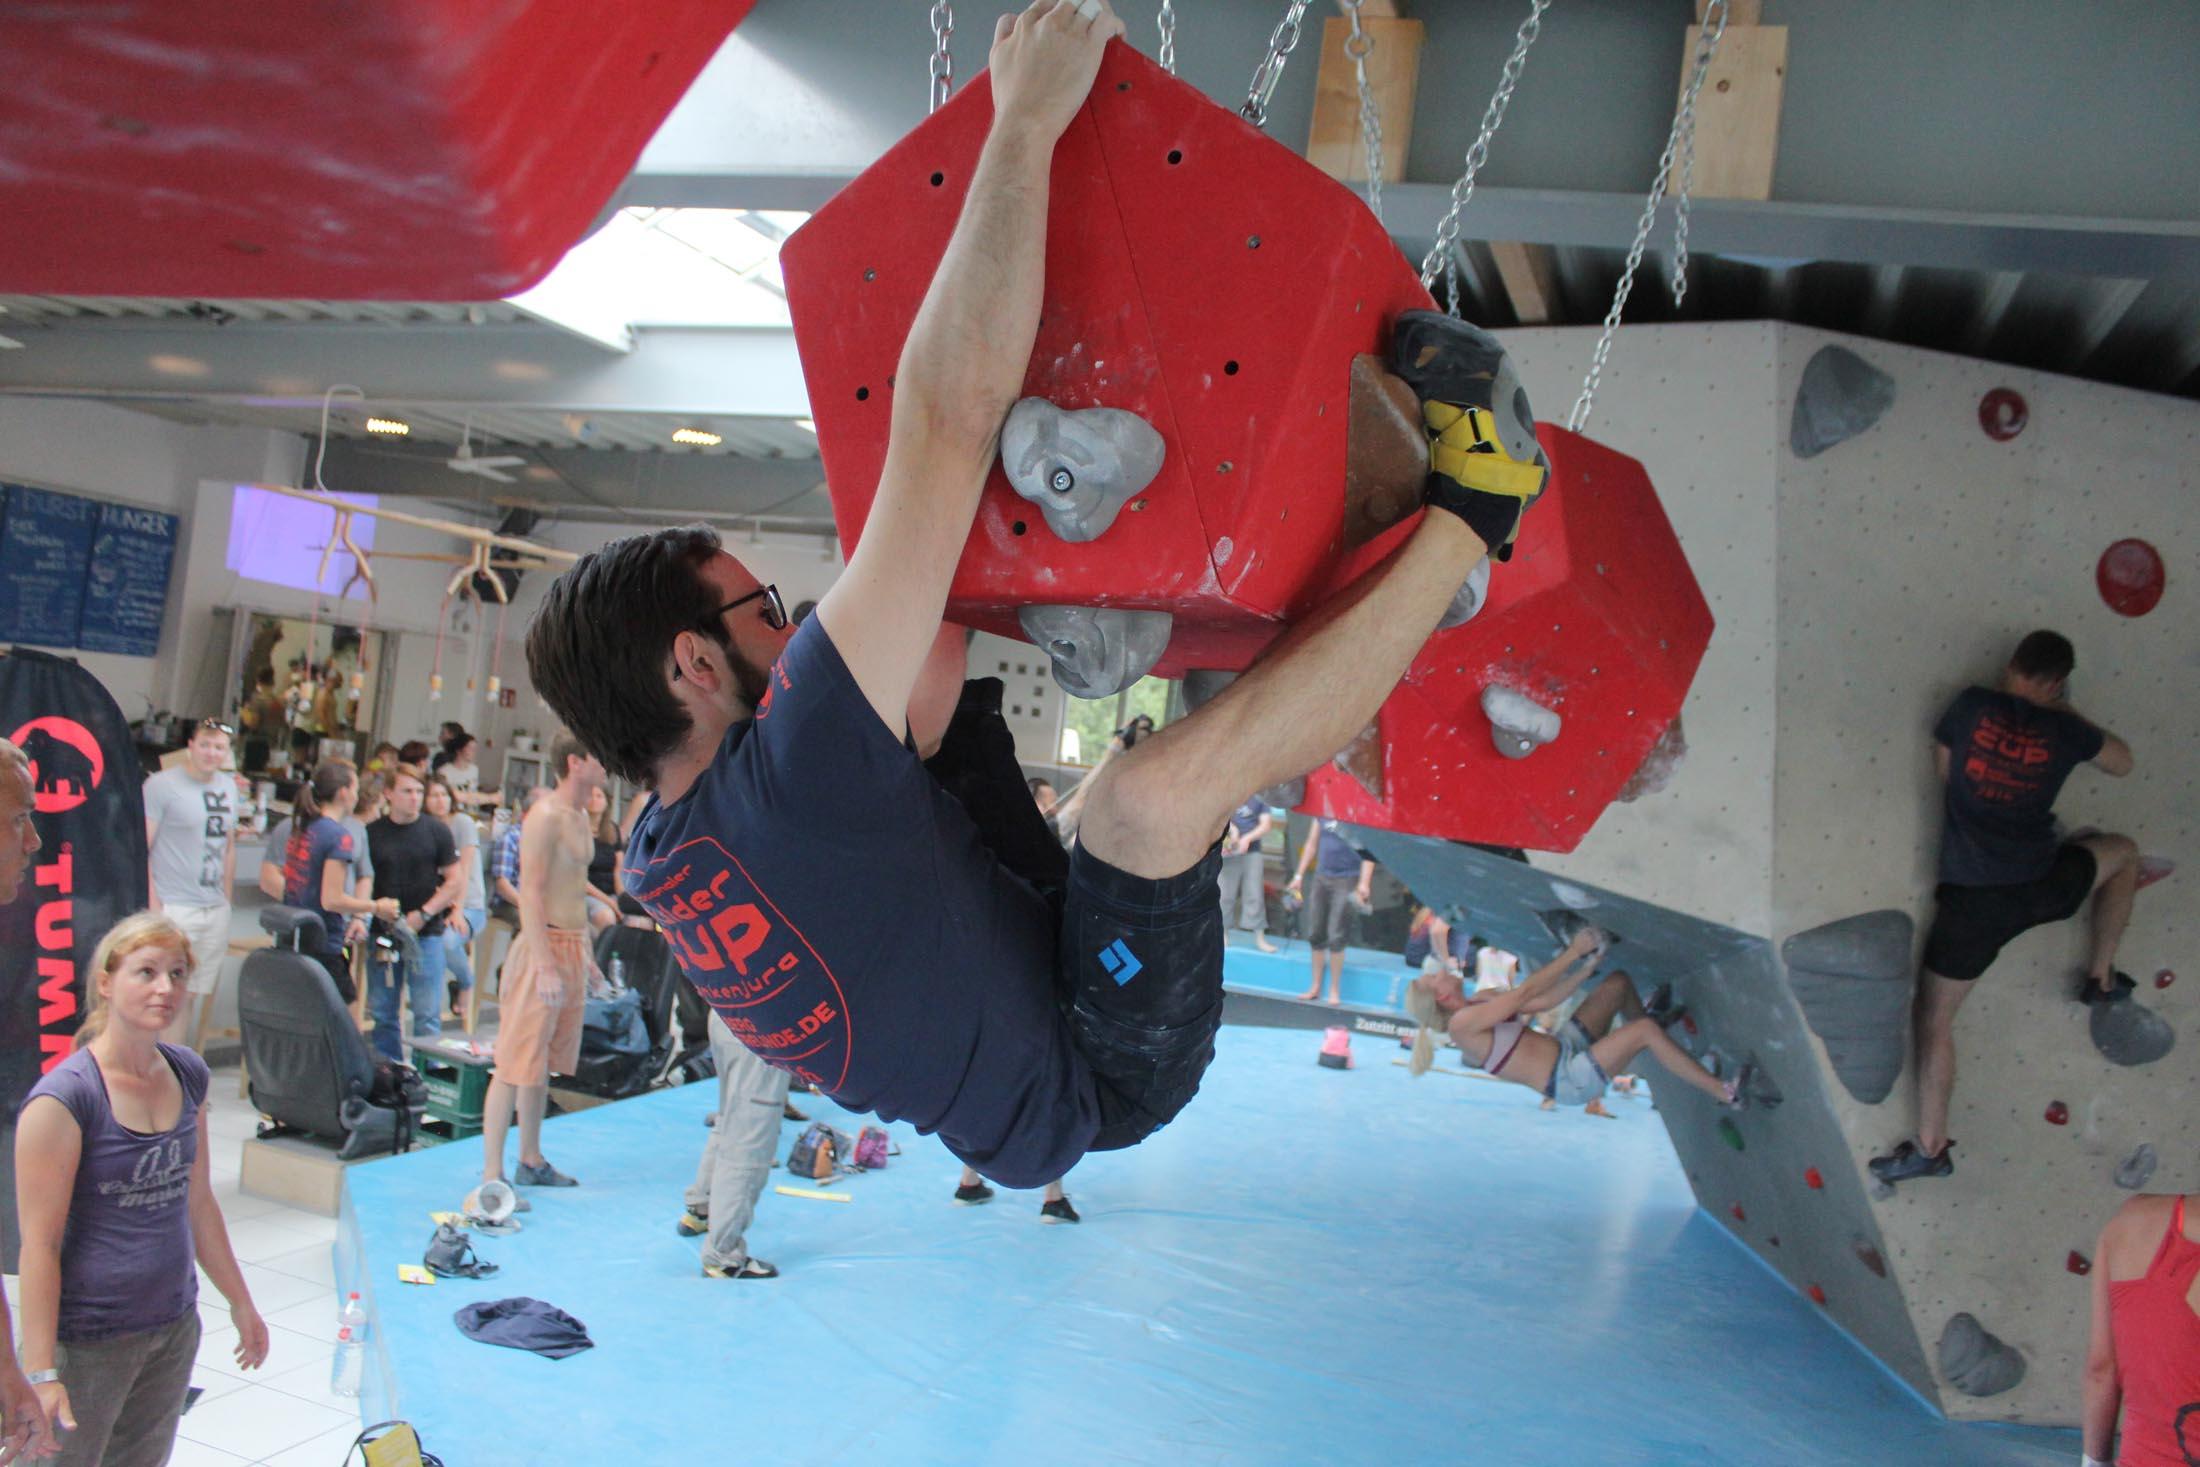 Quali, internationaler bouldercup Frankenjura 2016, BLOCKHELDEN Erlangen, Mammut, Bergfreunde.de, Boulderwettkampf07092016198